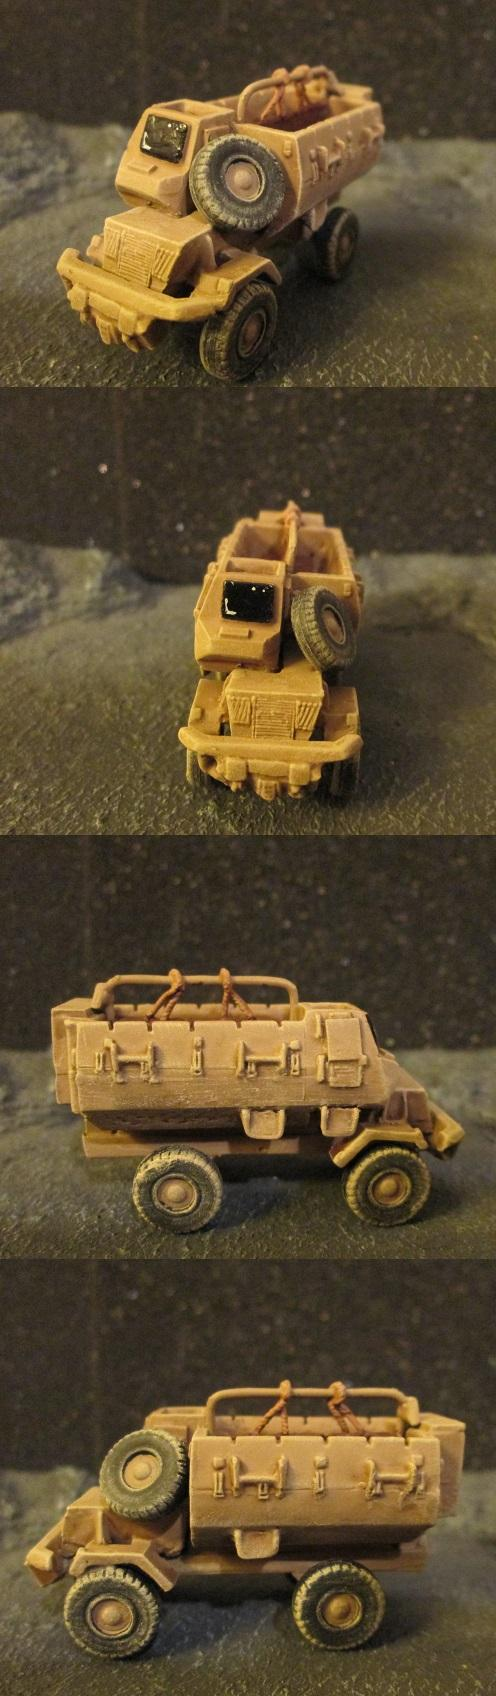 15mm, Apc, Bulldog, Truck